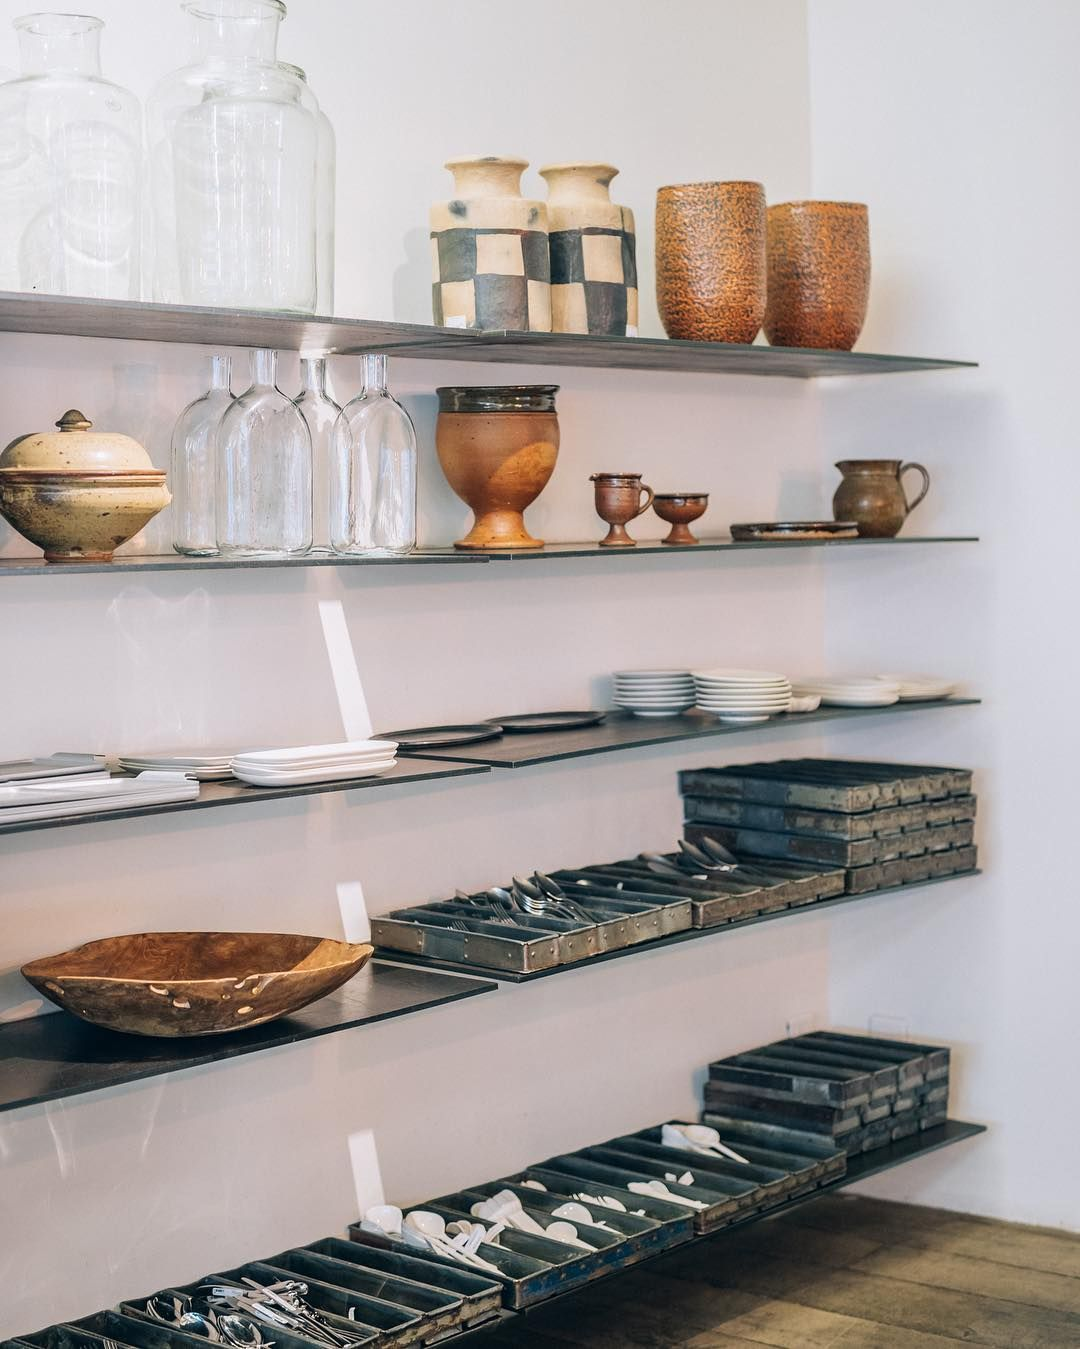 Merci's first floor   Mix and match of materials #craftmanship #vases #ceramics #glassware #stoneware